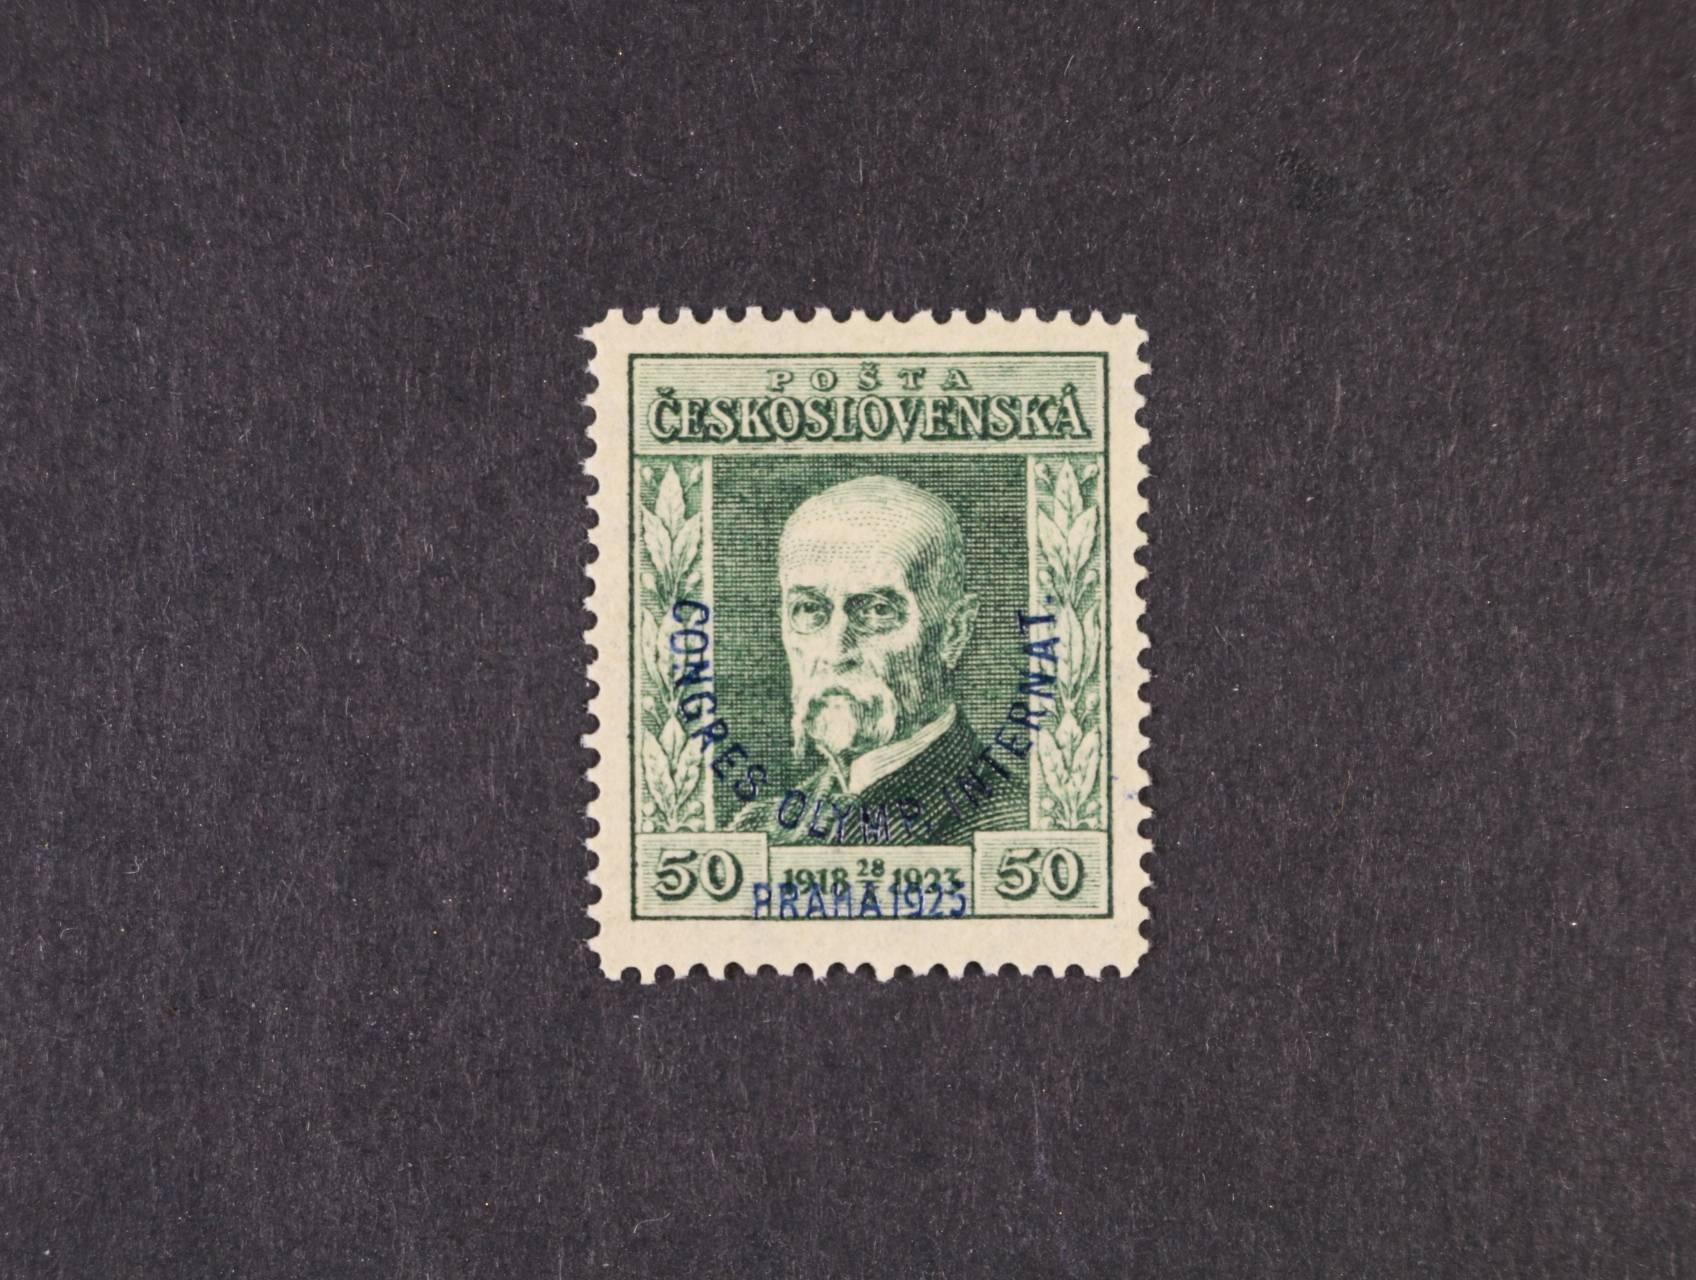 zn. č. 180, pr. 8, zk.Mrňák, Gilbert